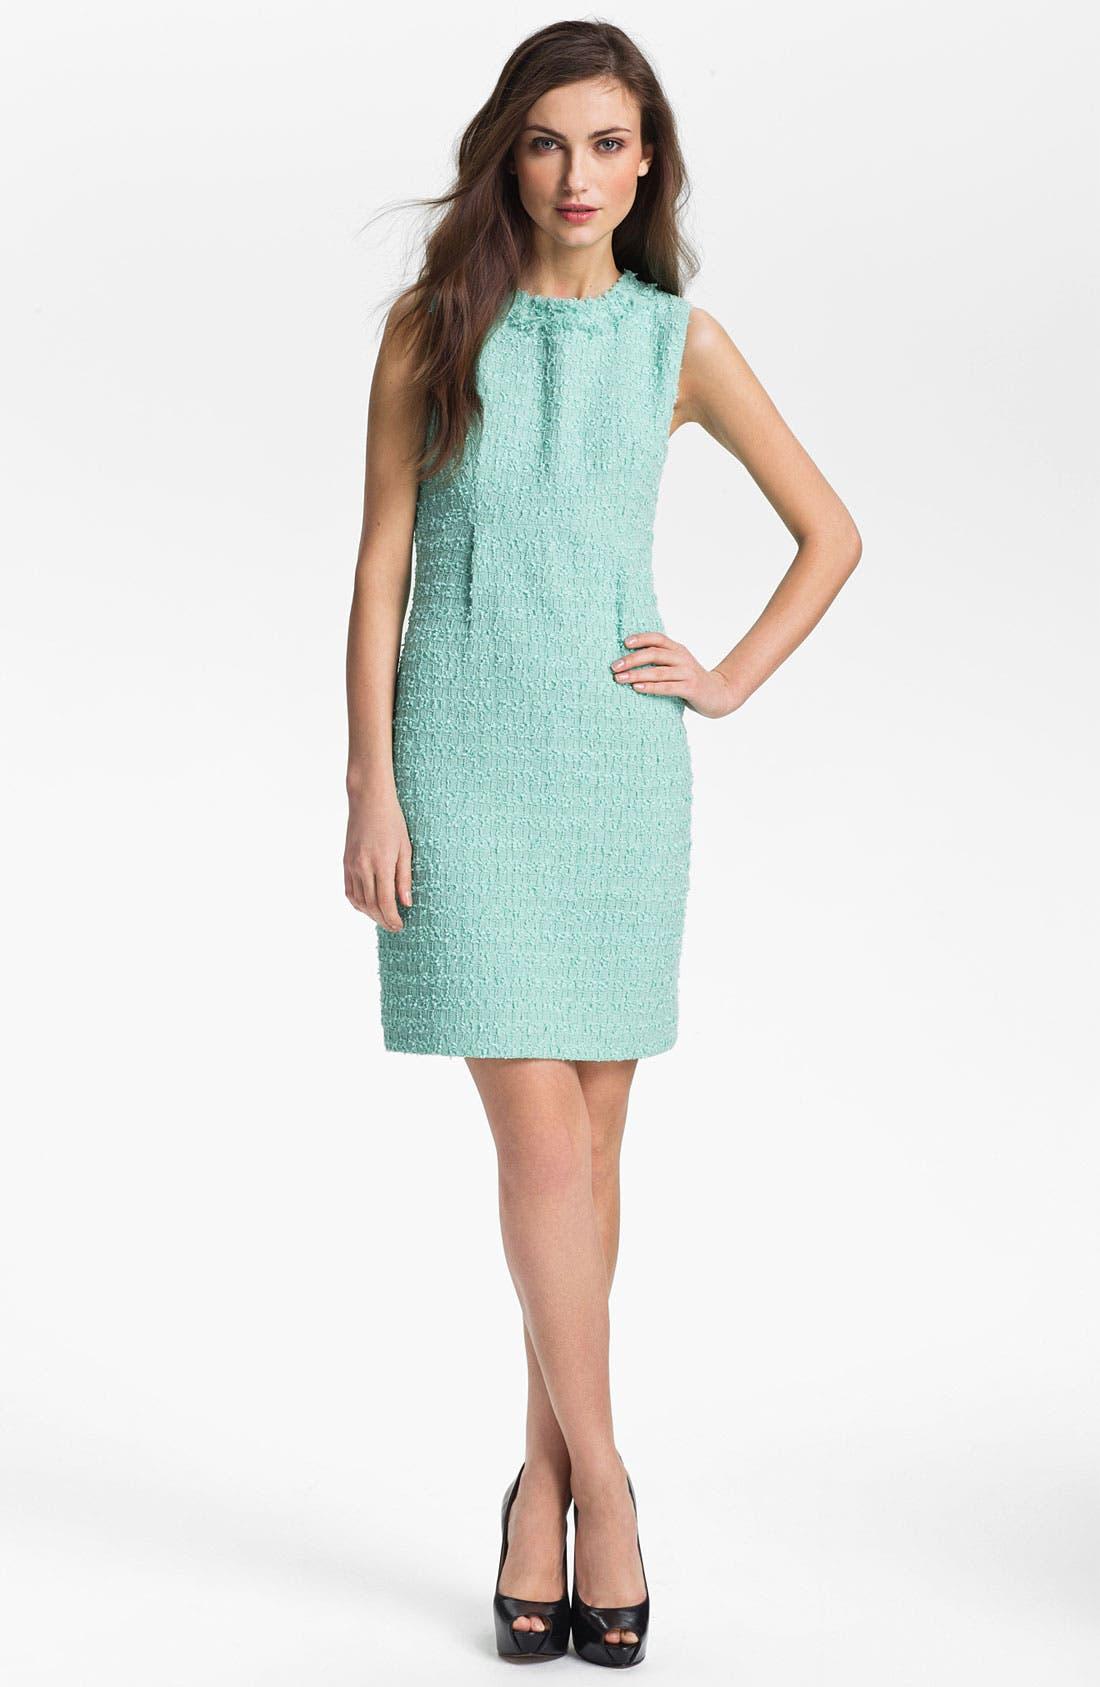 Alternate Image 1 Selected - kate spade new york 'terri' tweed sheath dress